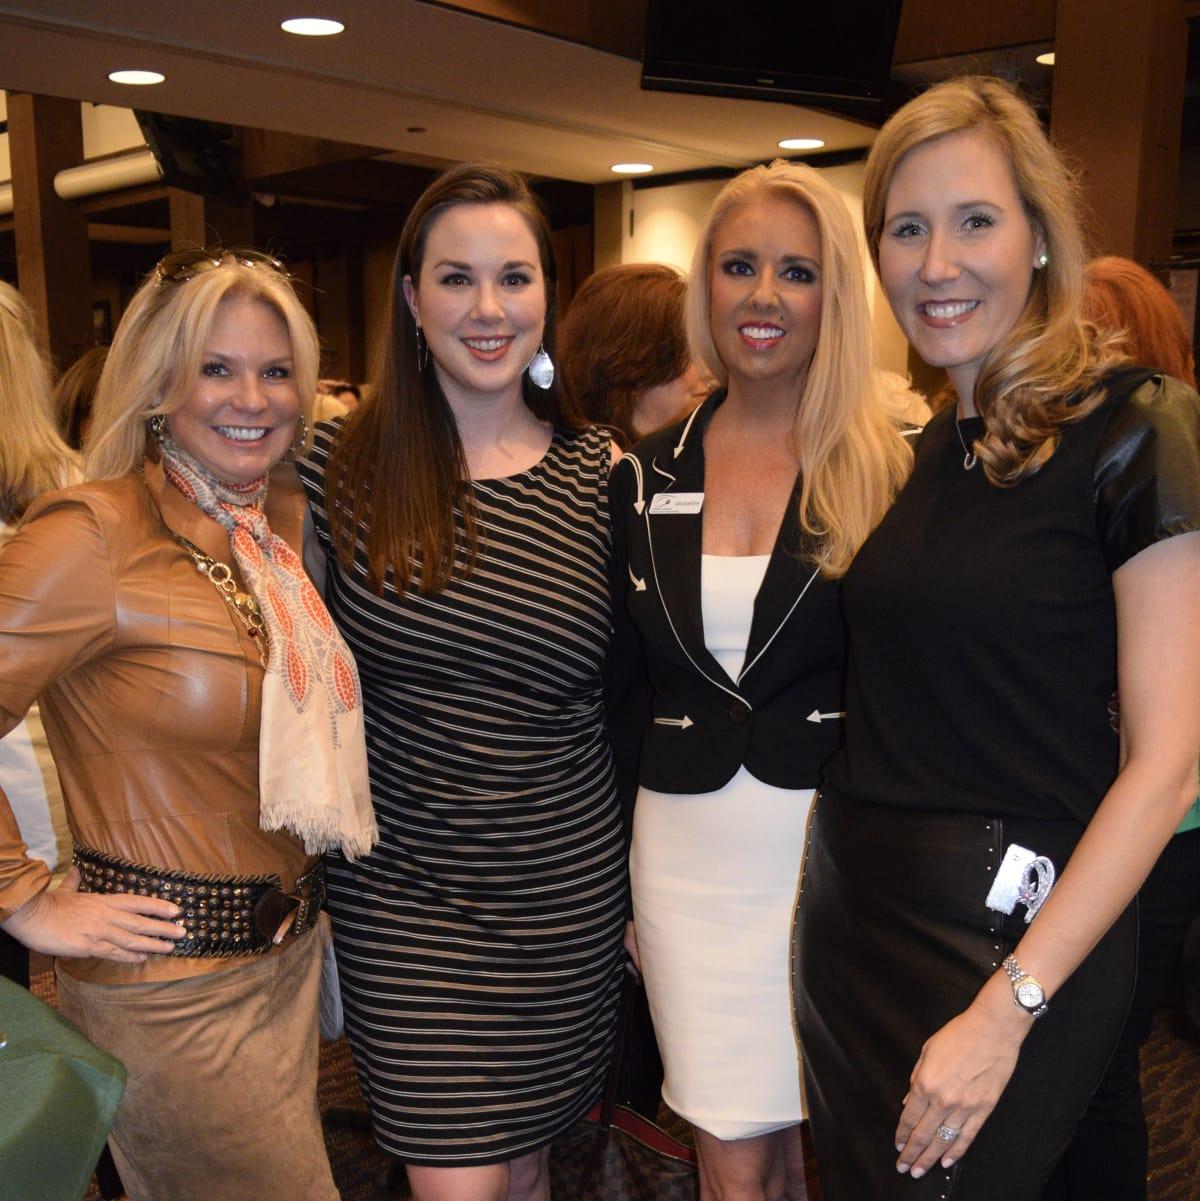 HLSR Trailblazers 2015 Terri Courtney, Patricia Kormann, Jacquine Levesque and Michelle Wasaff